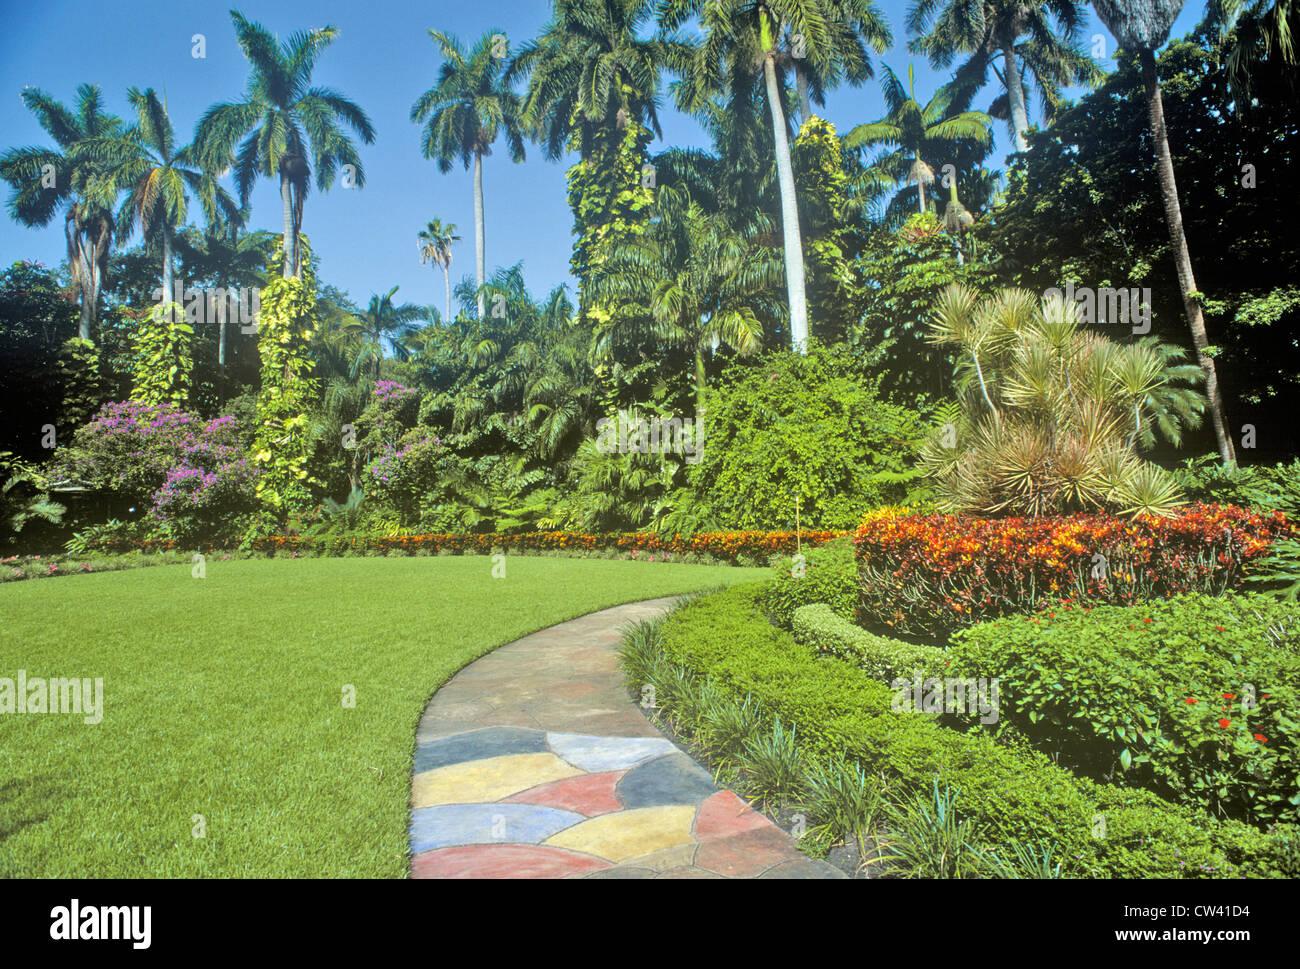 Sunken Gardens Florida 39 S Foremost Botanical Gardens St Petersburg Stock Photo Royalty Free